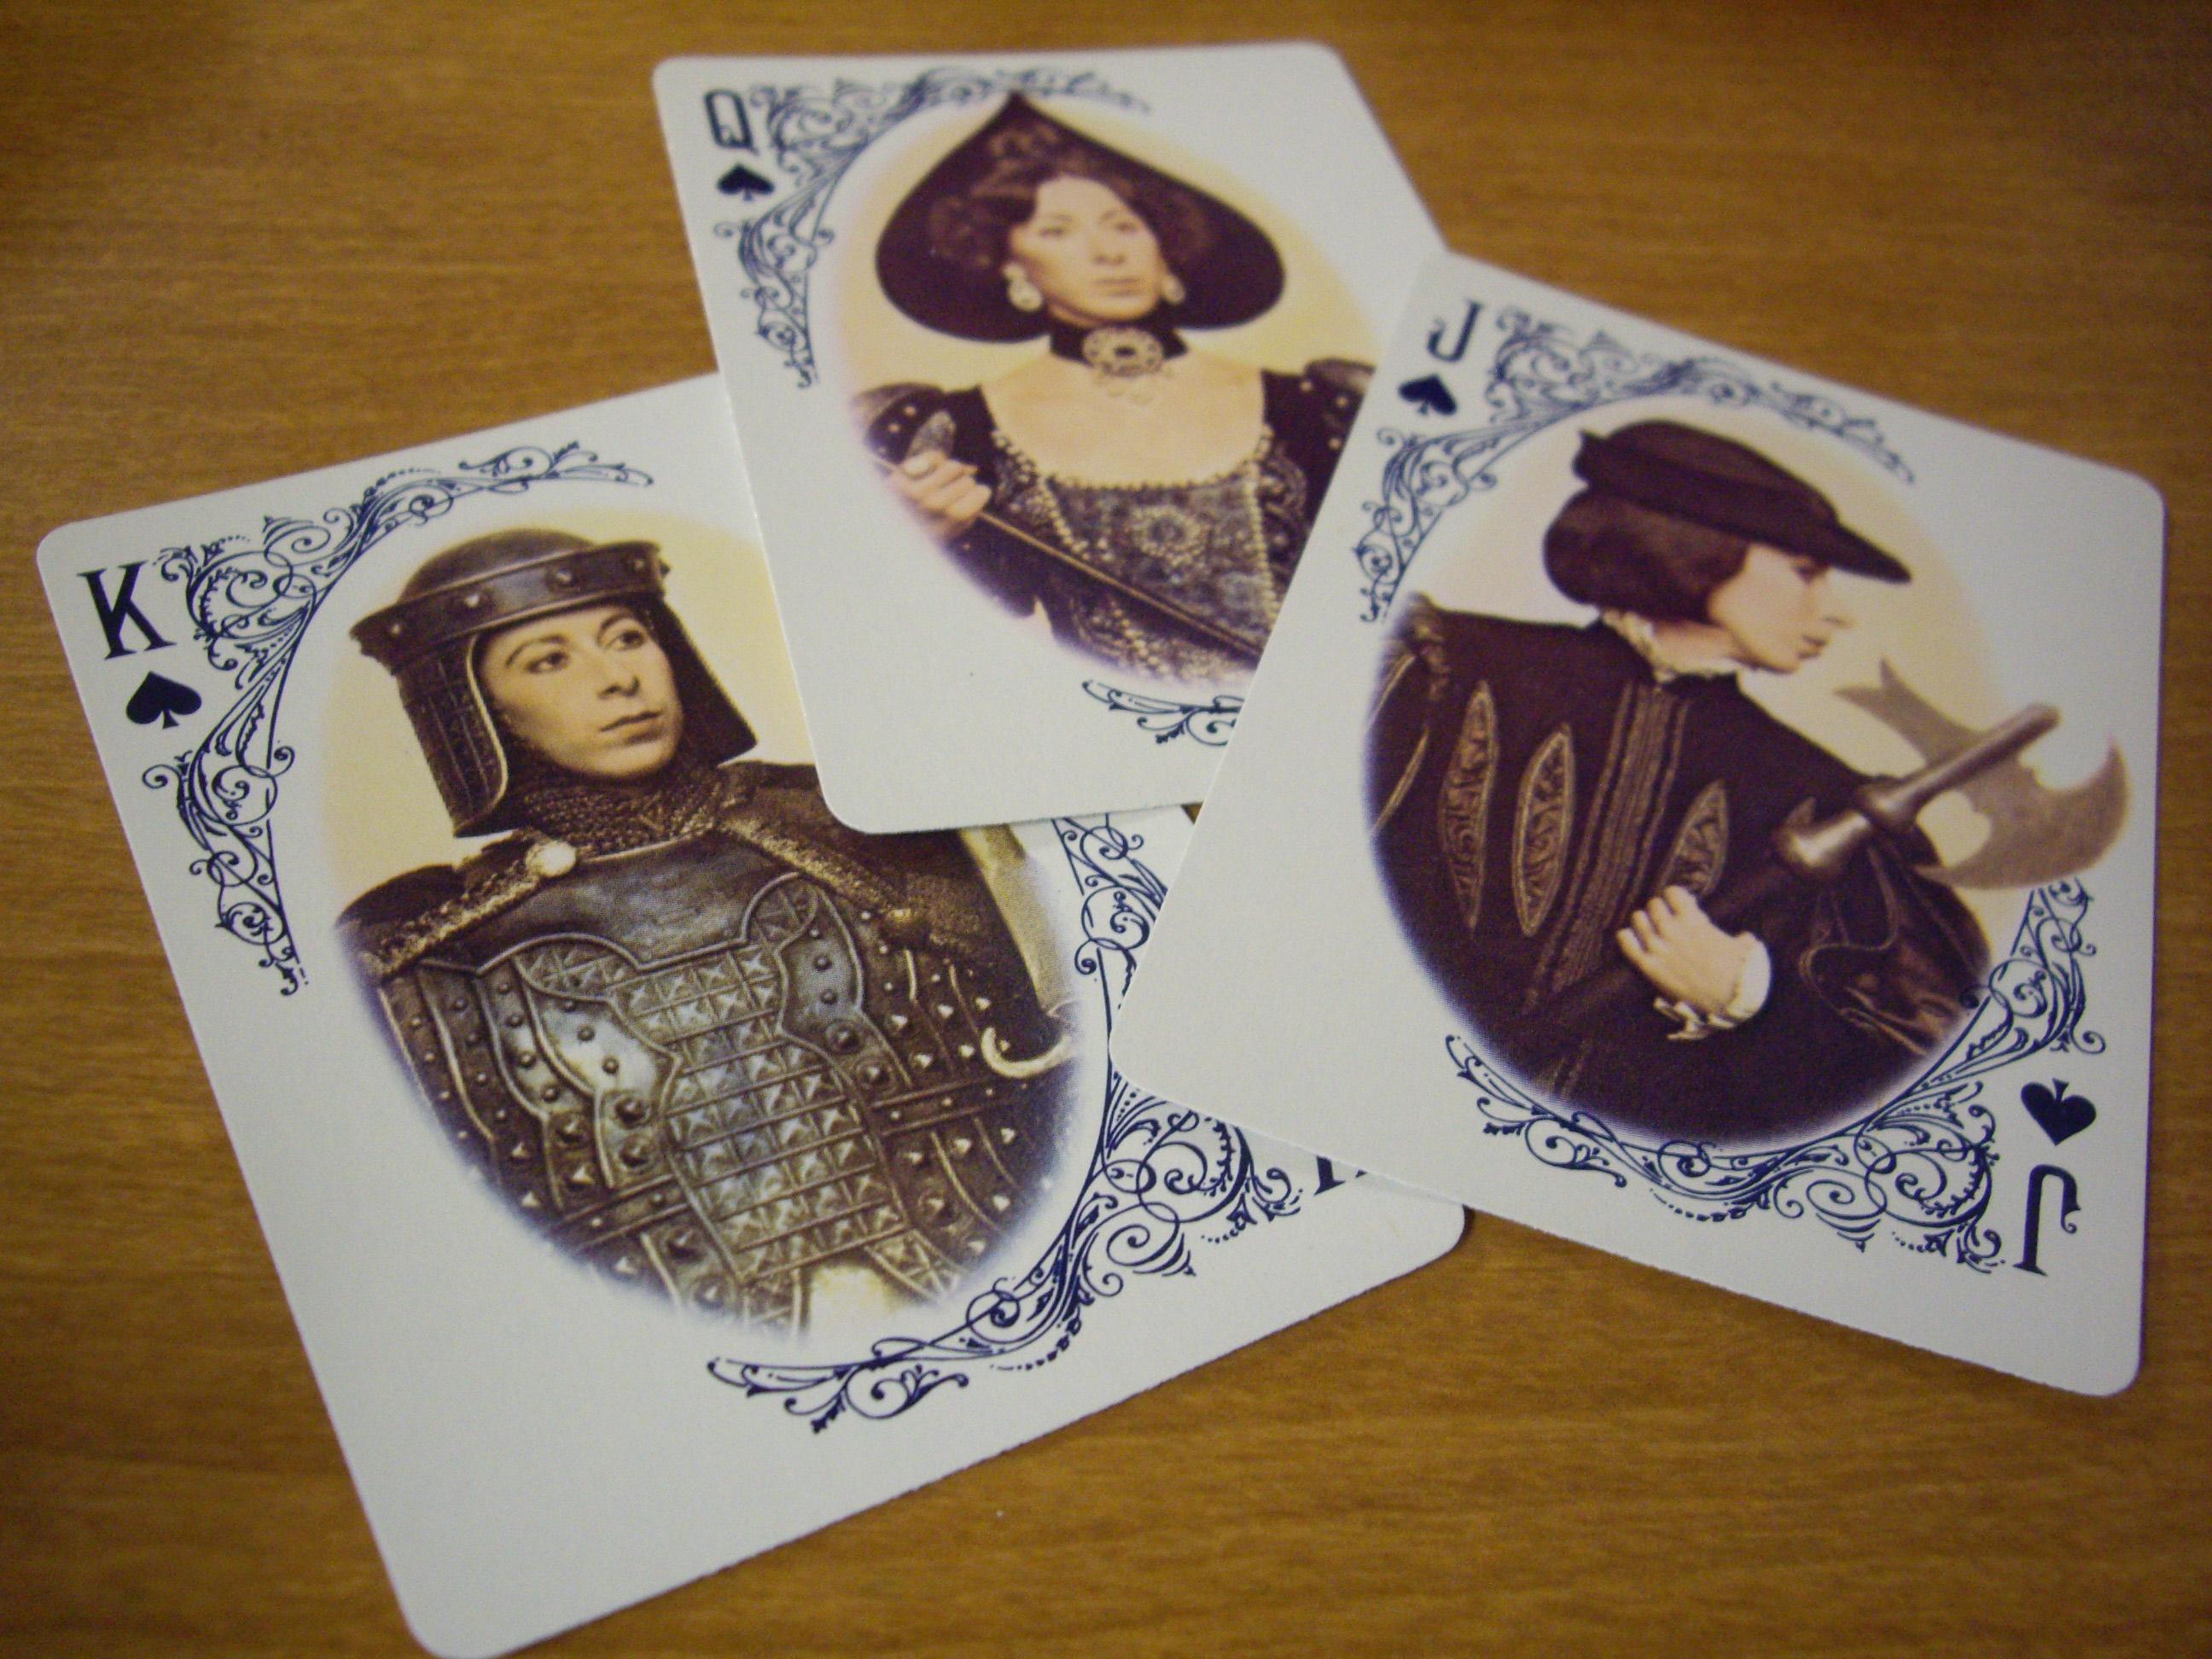 Virginia Slims : Court cards